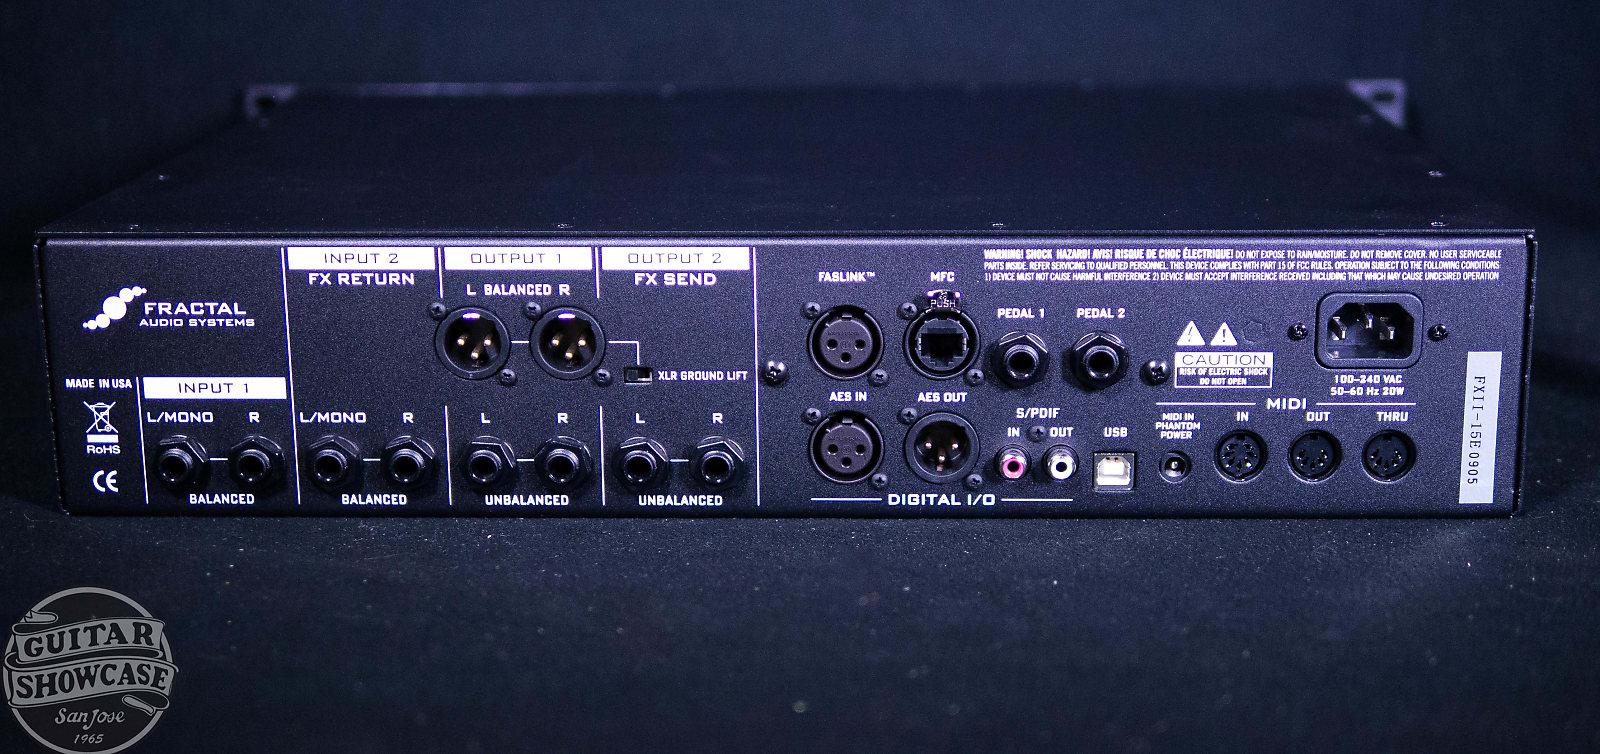 Fractal Audio Axe FX II XL+ Preamp/Effects Processor